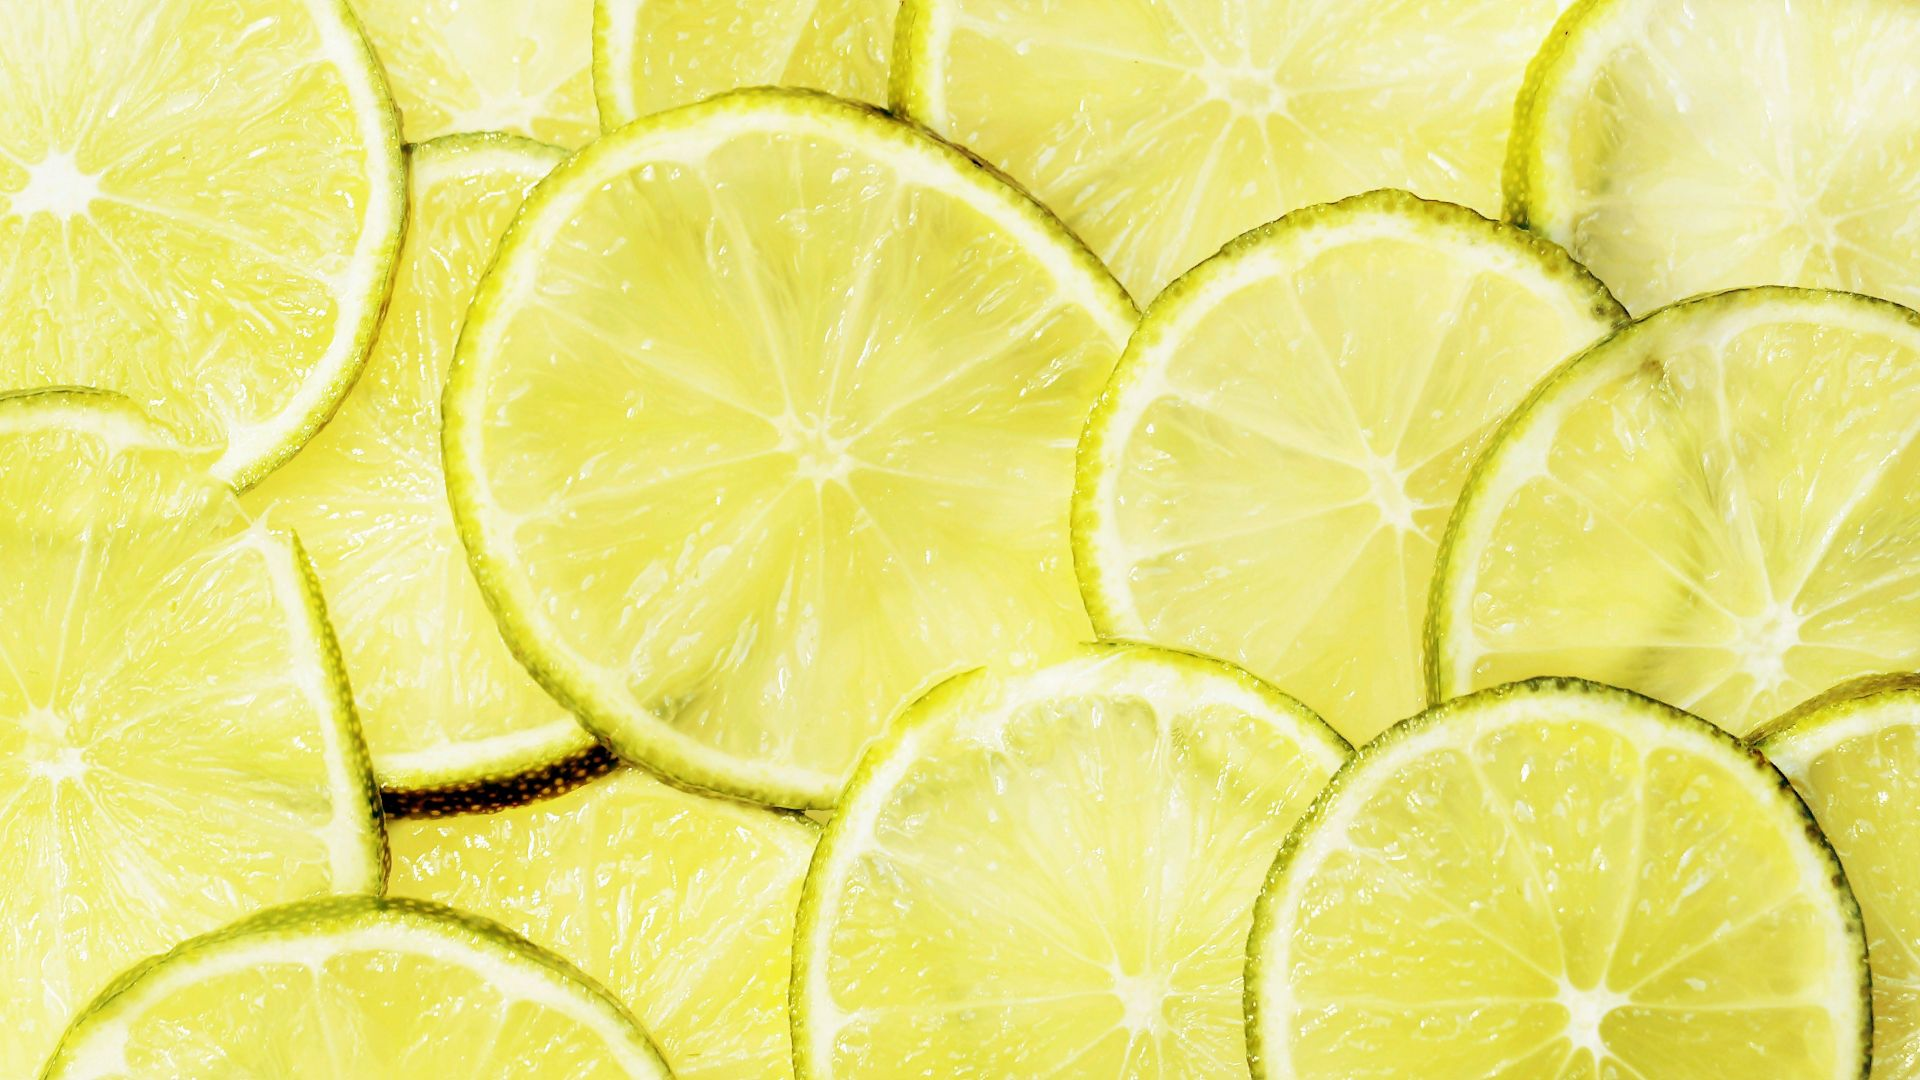 Desktop Wallpaper Lemon Slices Yellow Fruits Lemon Hd